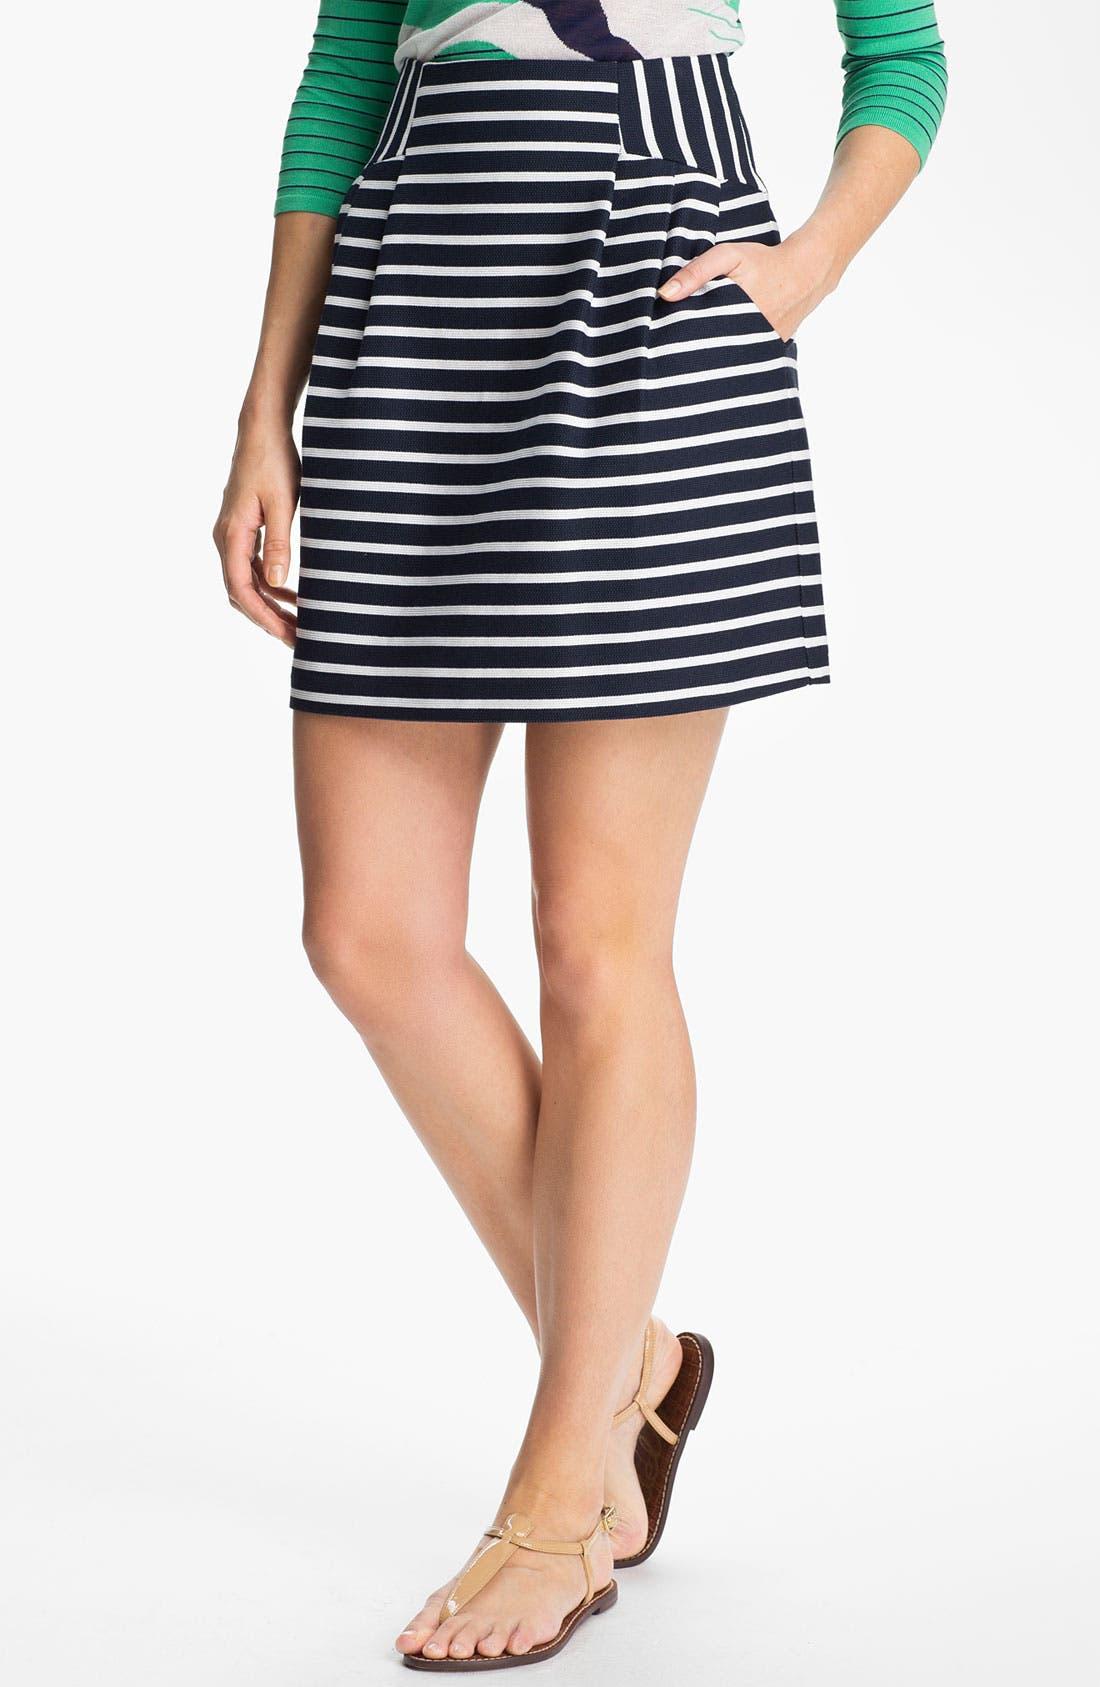 Alternate Image 1 Selected - Nanette Lepore 'Ka-Pow' A-Line Skirt